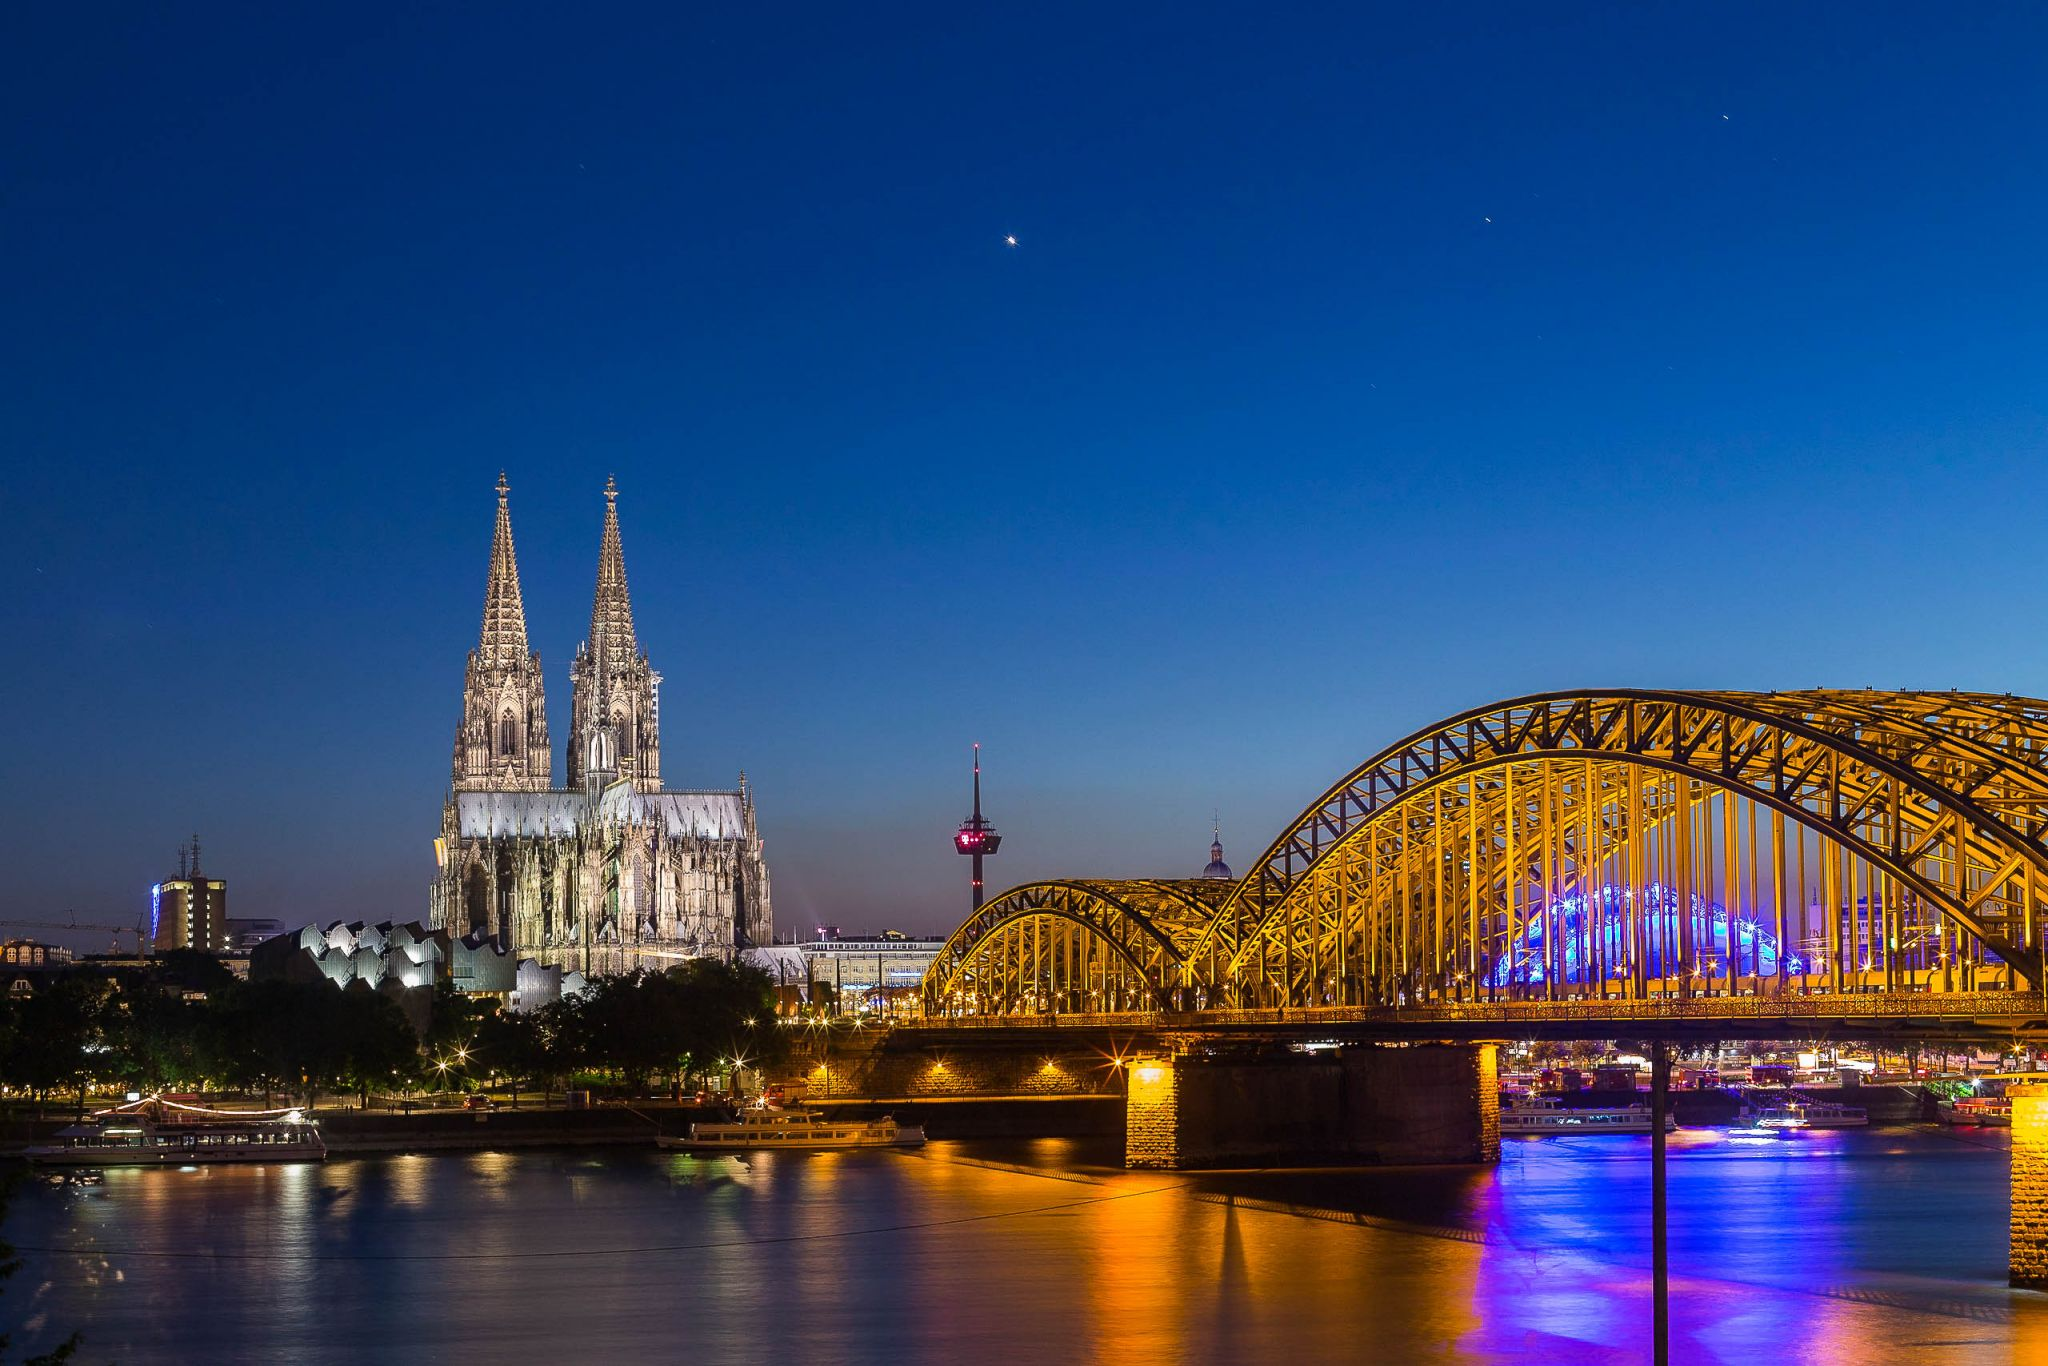 View from Hyatt Regency Cologne, Germany